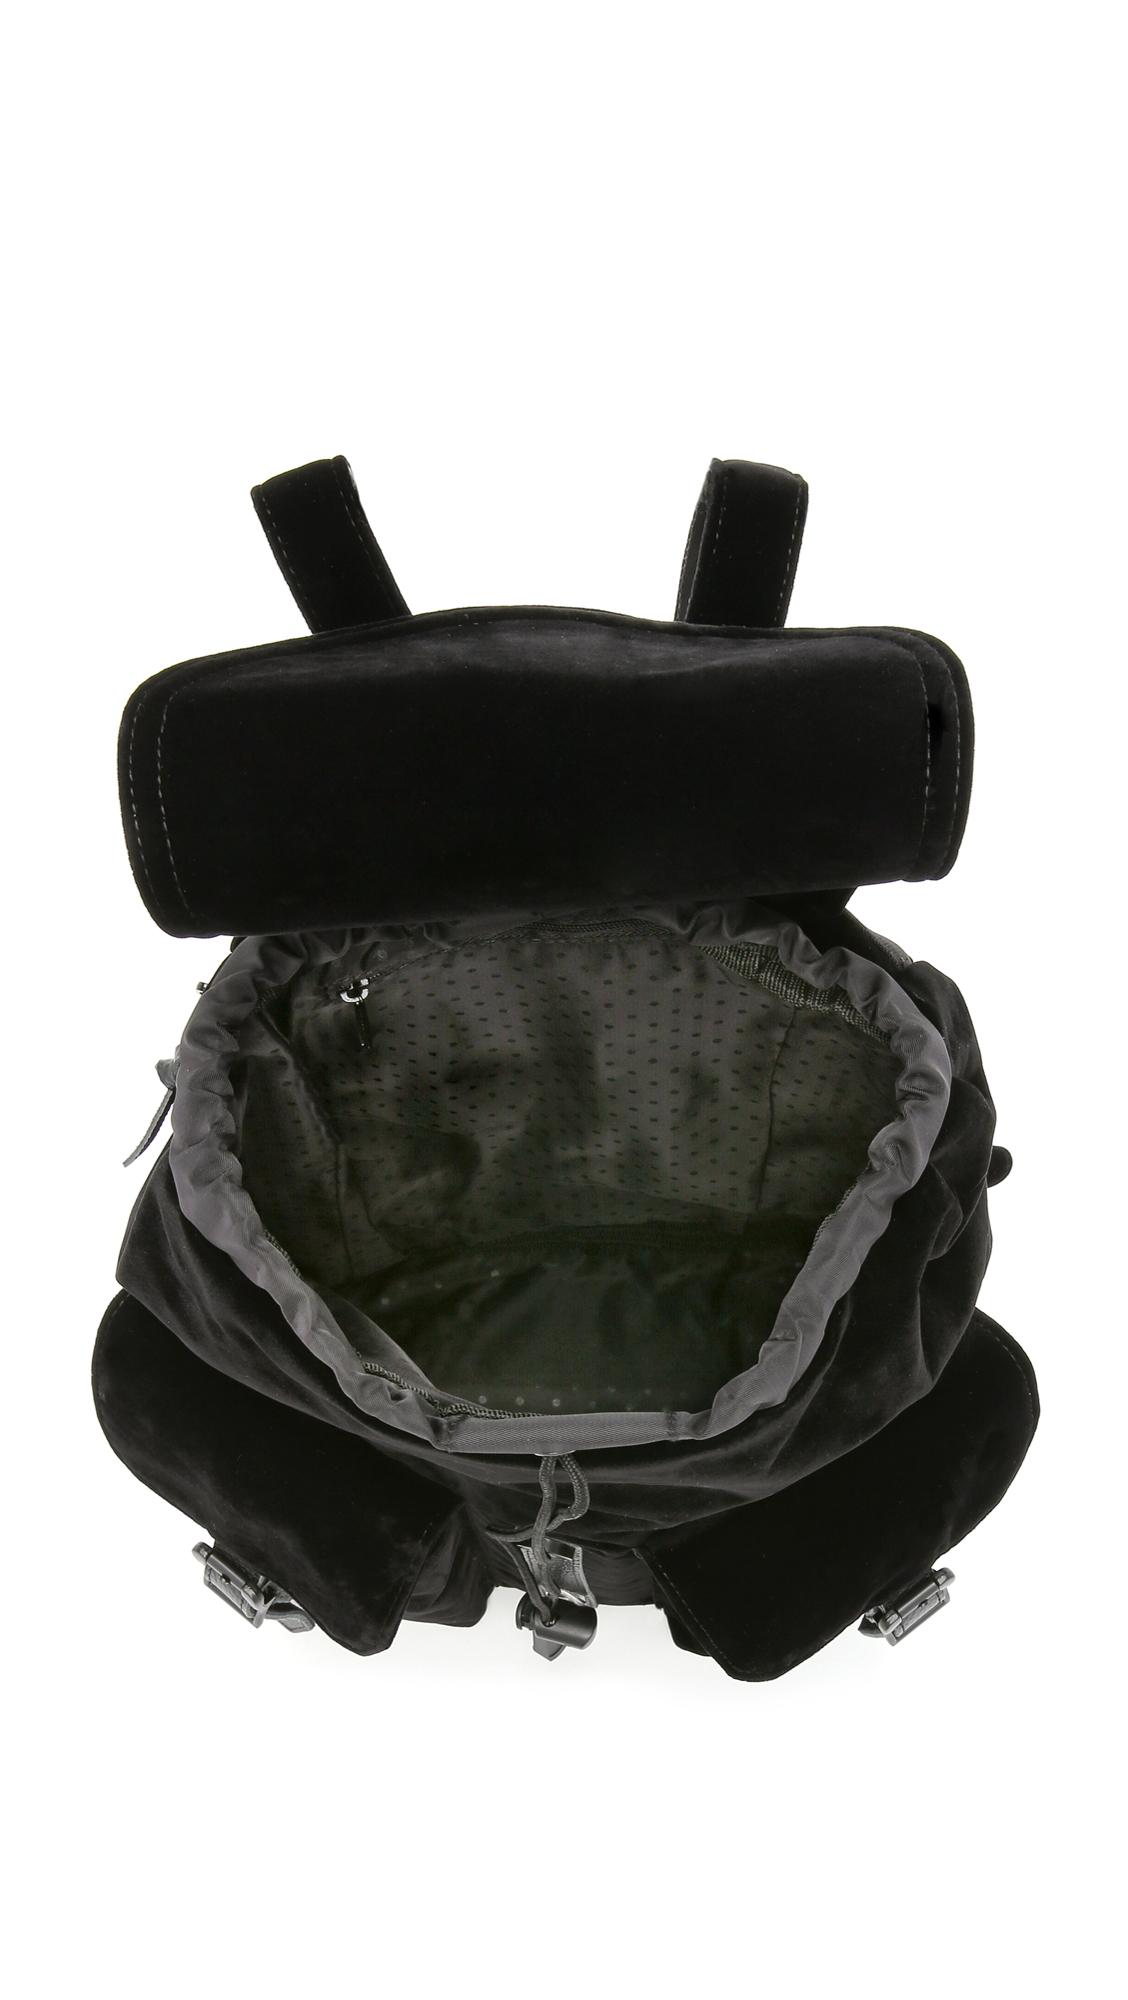 Lyst - Herschel Supply Co. Velvet Dawson Backpack - Black in Black 02a575223c767